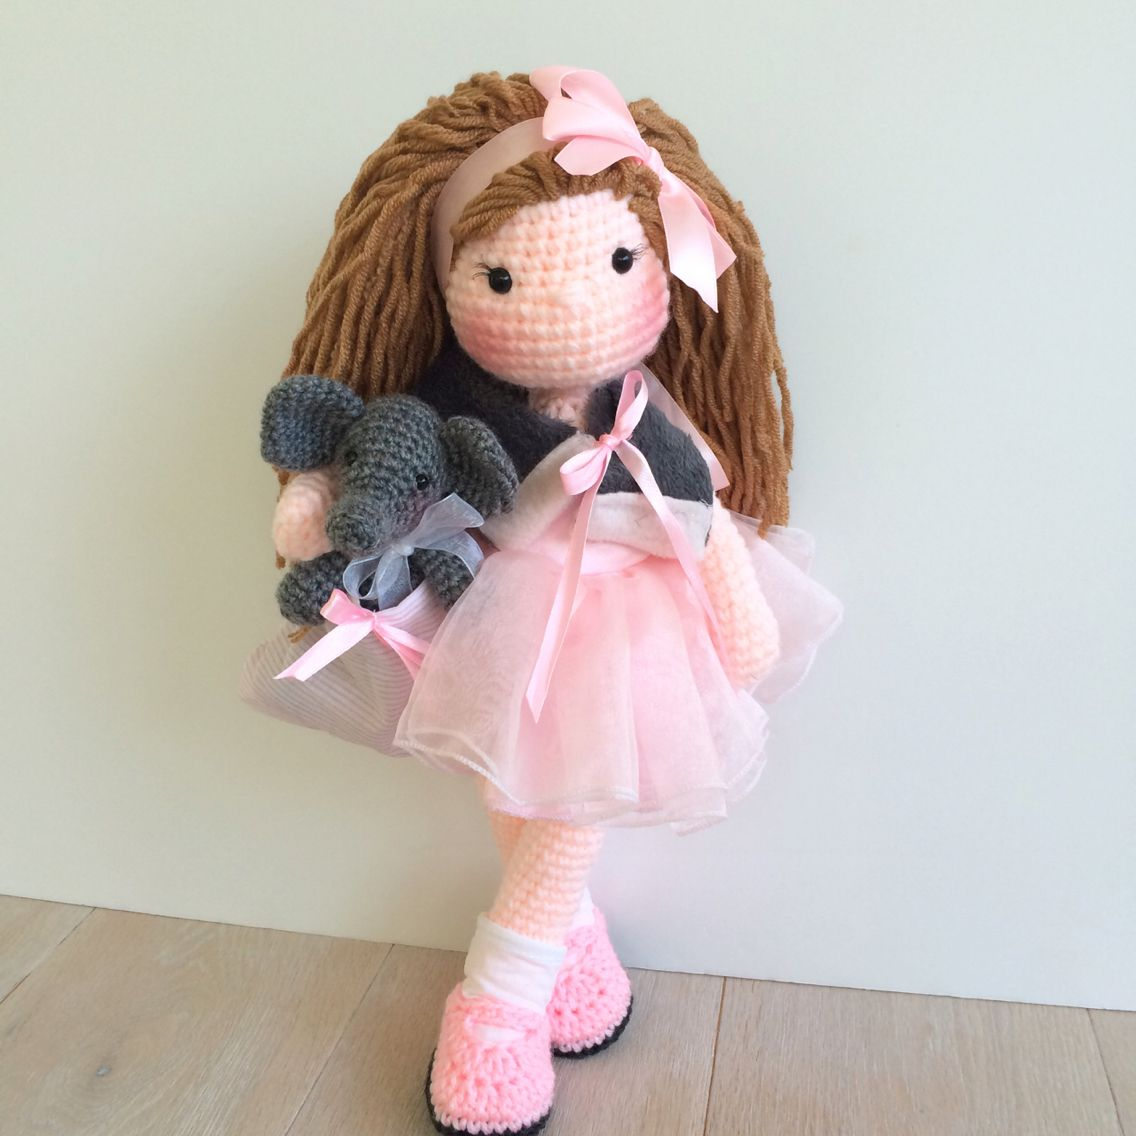 Knitting Pattern Ballerina Doll : Amigurumi ballerina and crochet elephant ...